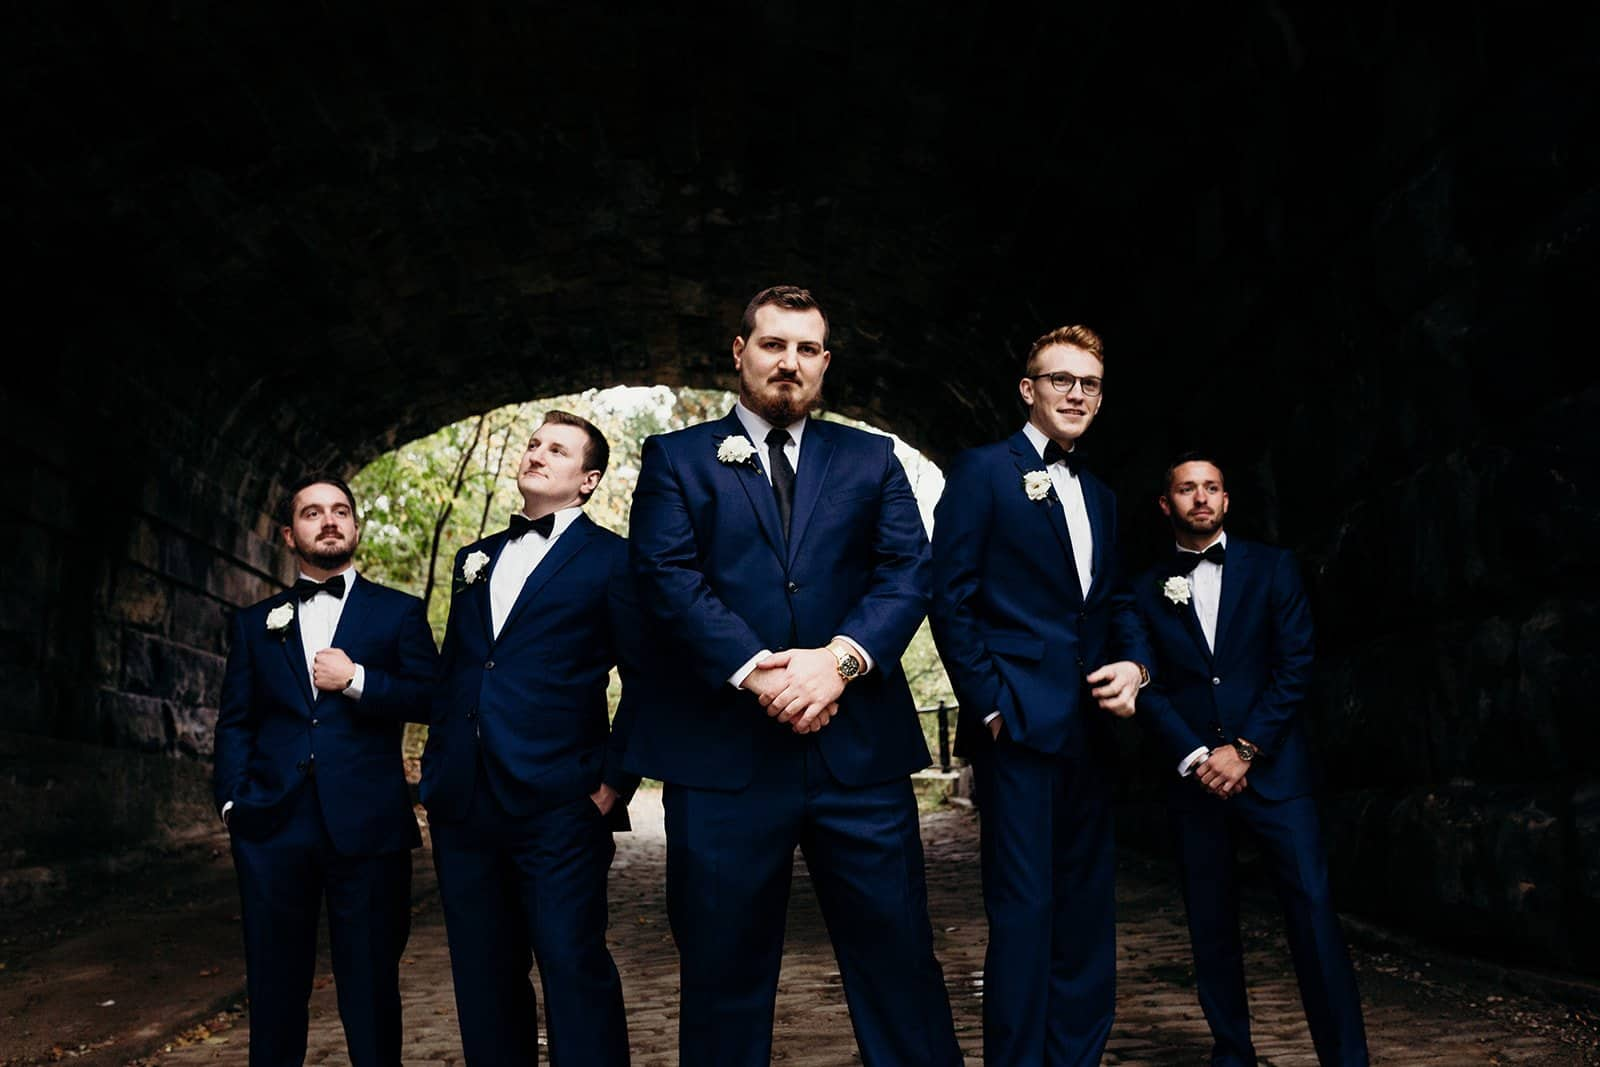 groomsman pose for bridal party photos